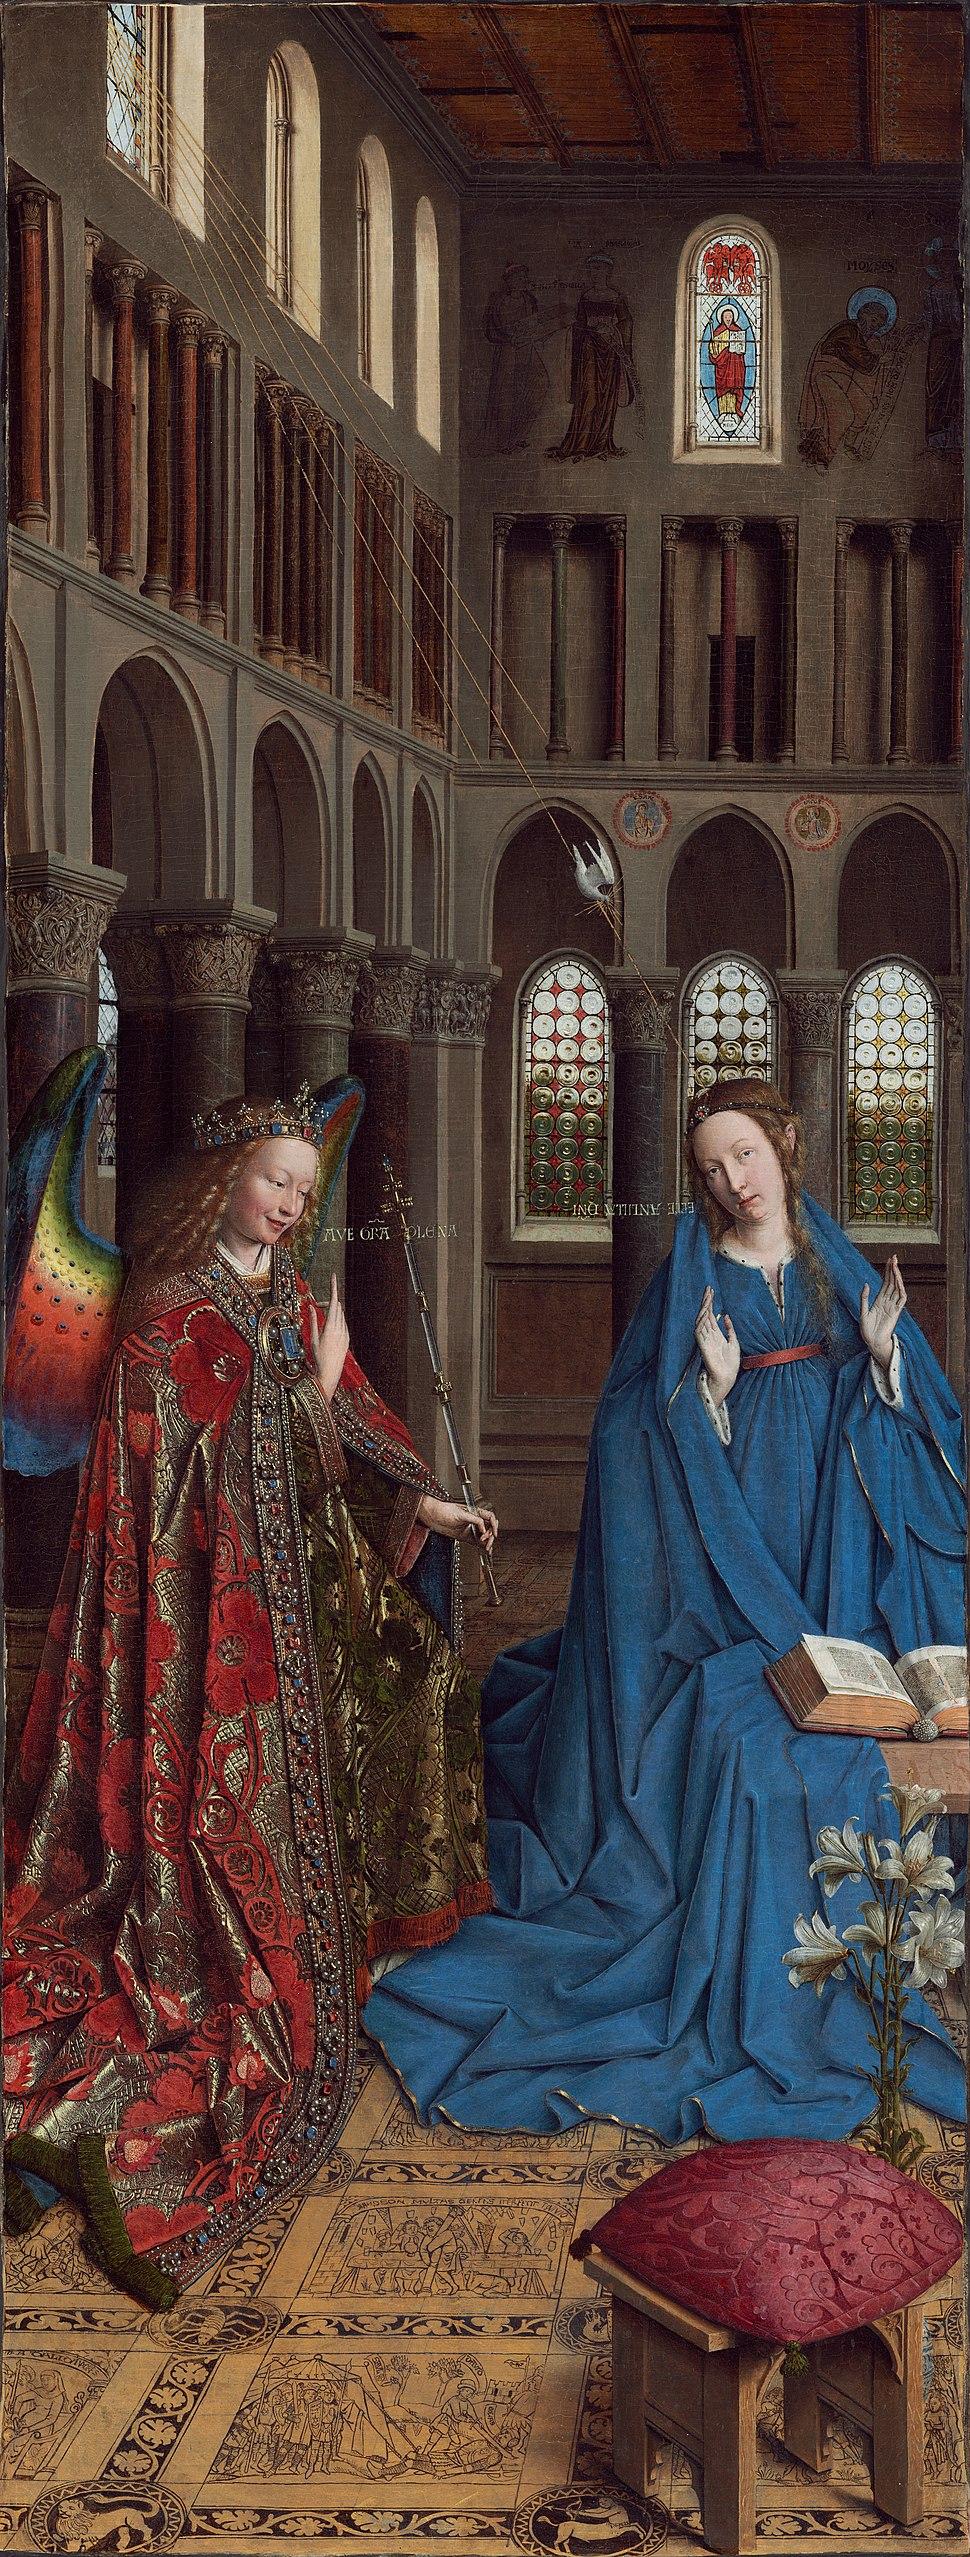 Annunciation - Jan van Eyck - 1434 - NG Wash DC